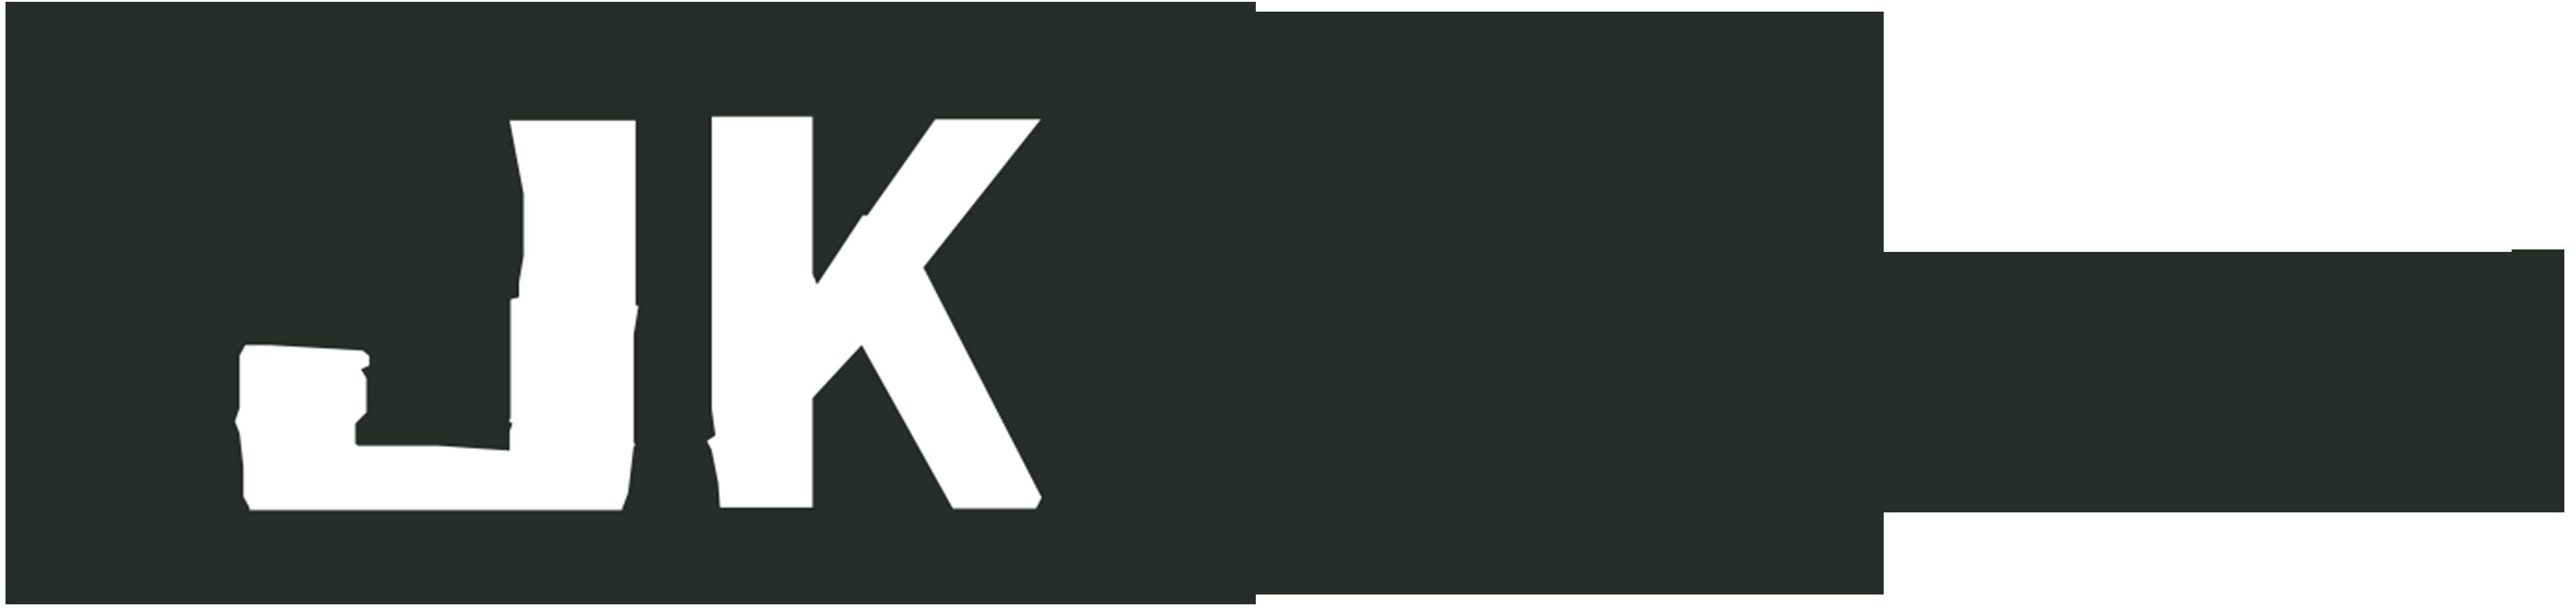 Jim Klaud